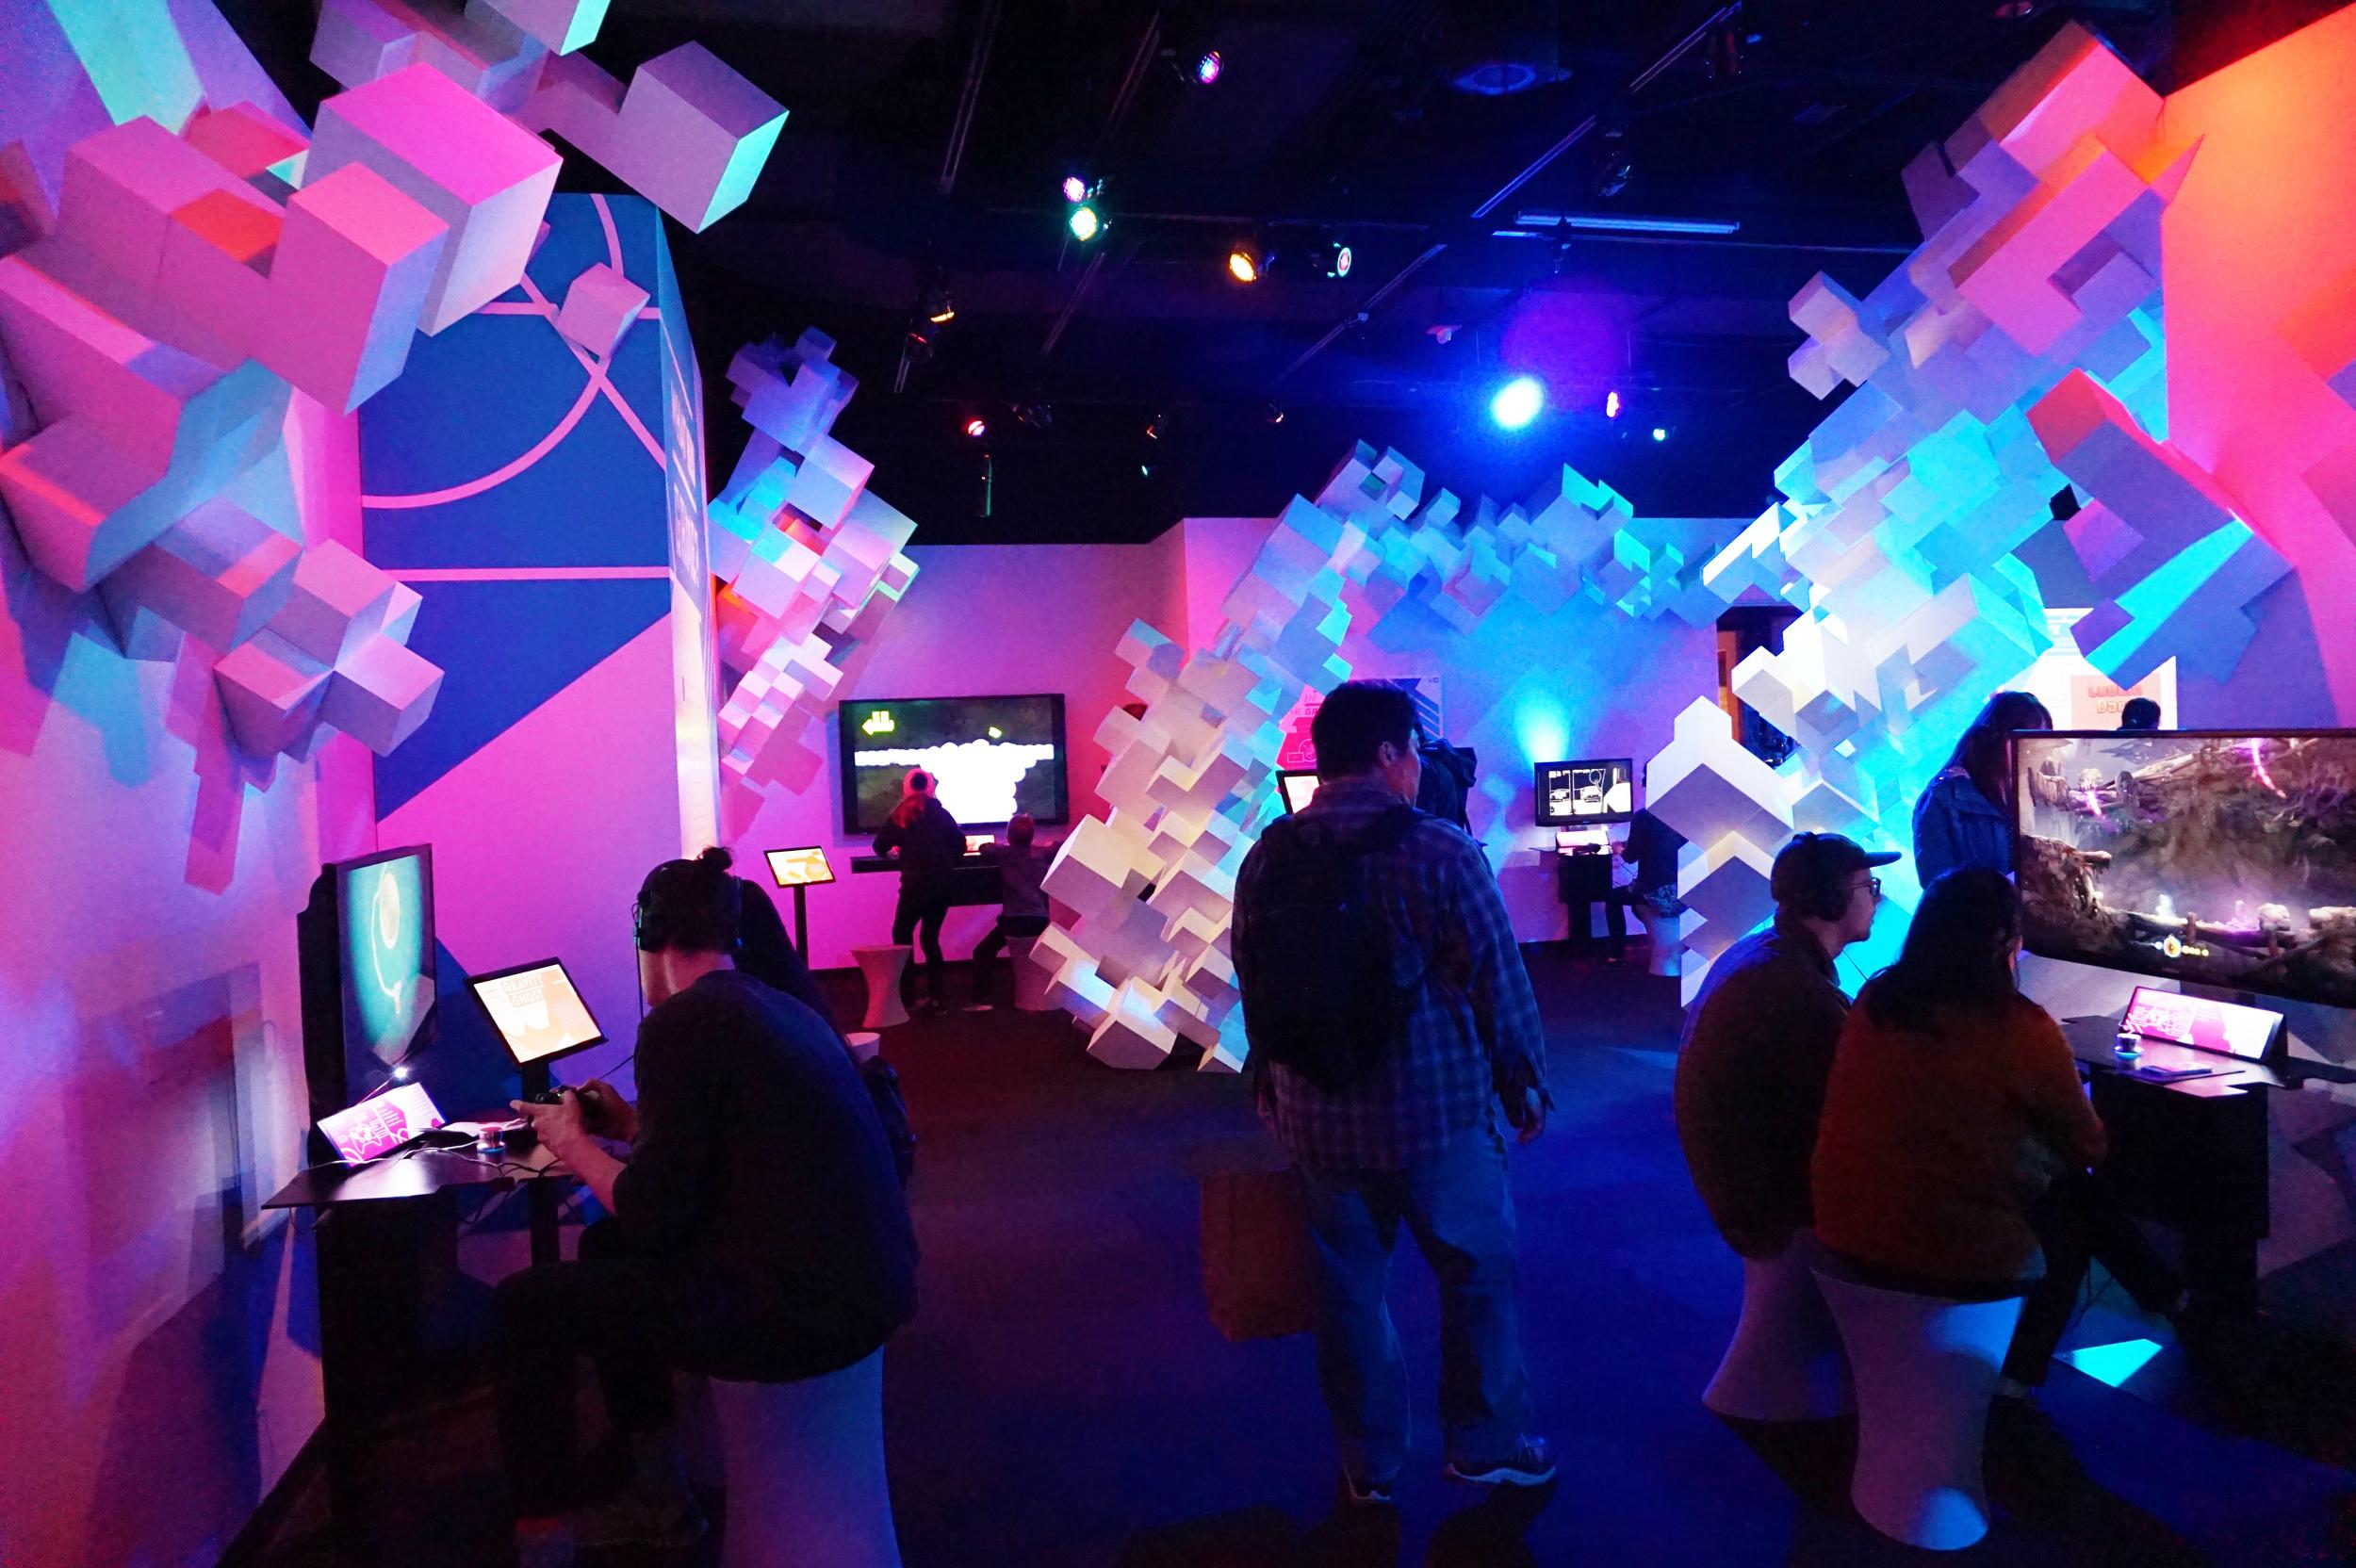 The indie game exhibit